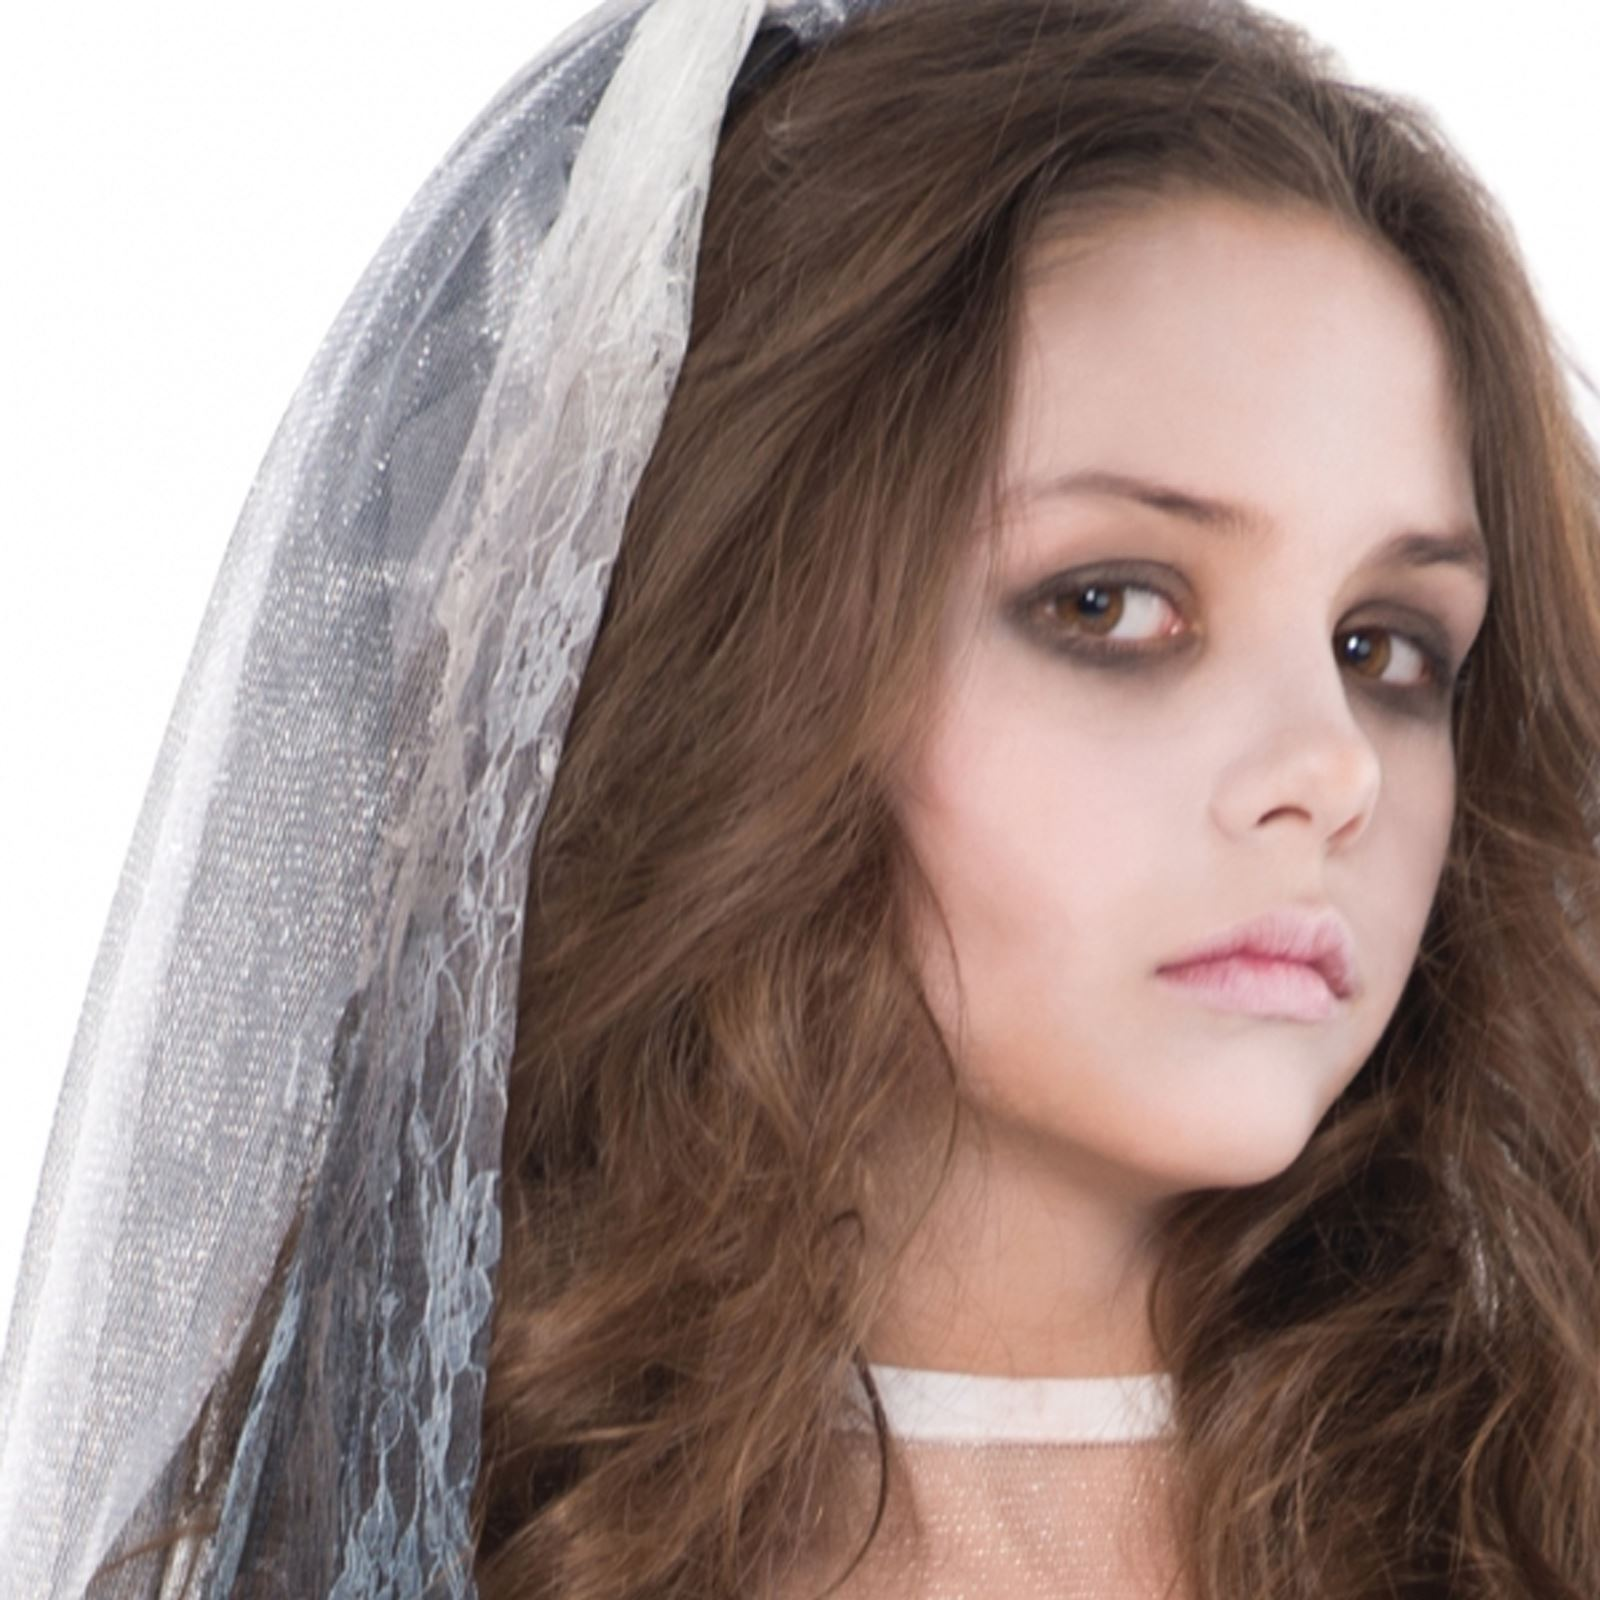 Teen Corpse Bride Halloween Ghost Wedding Zombie Girl